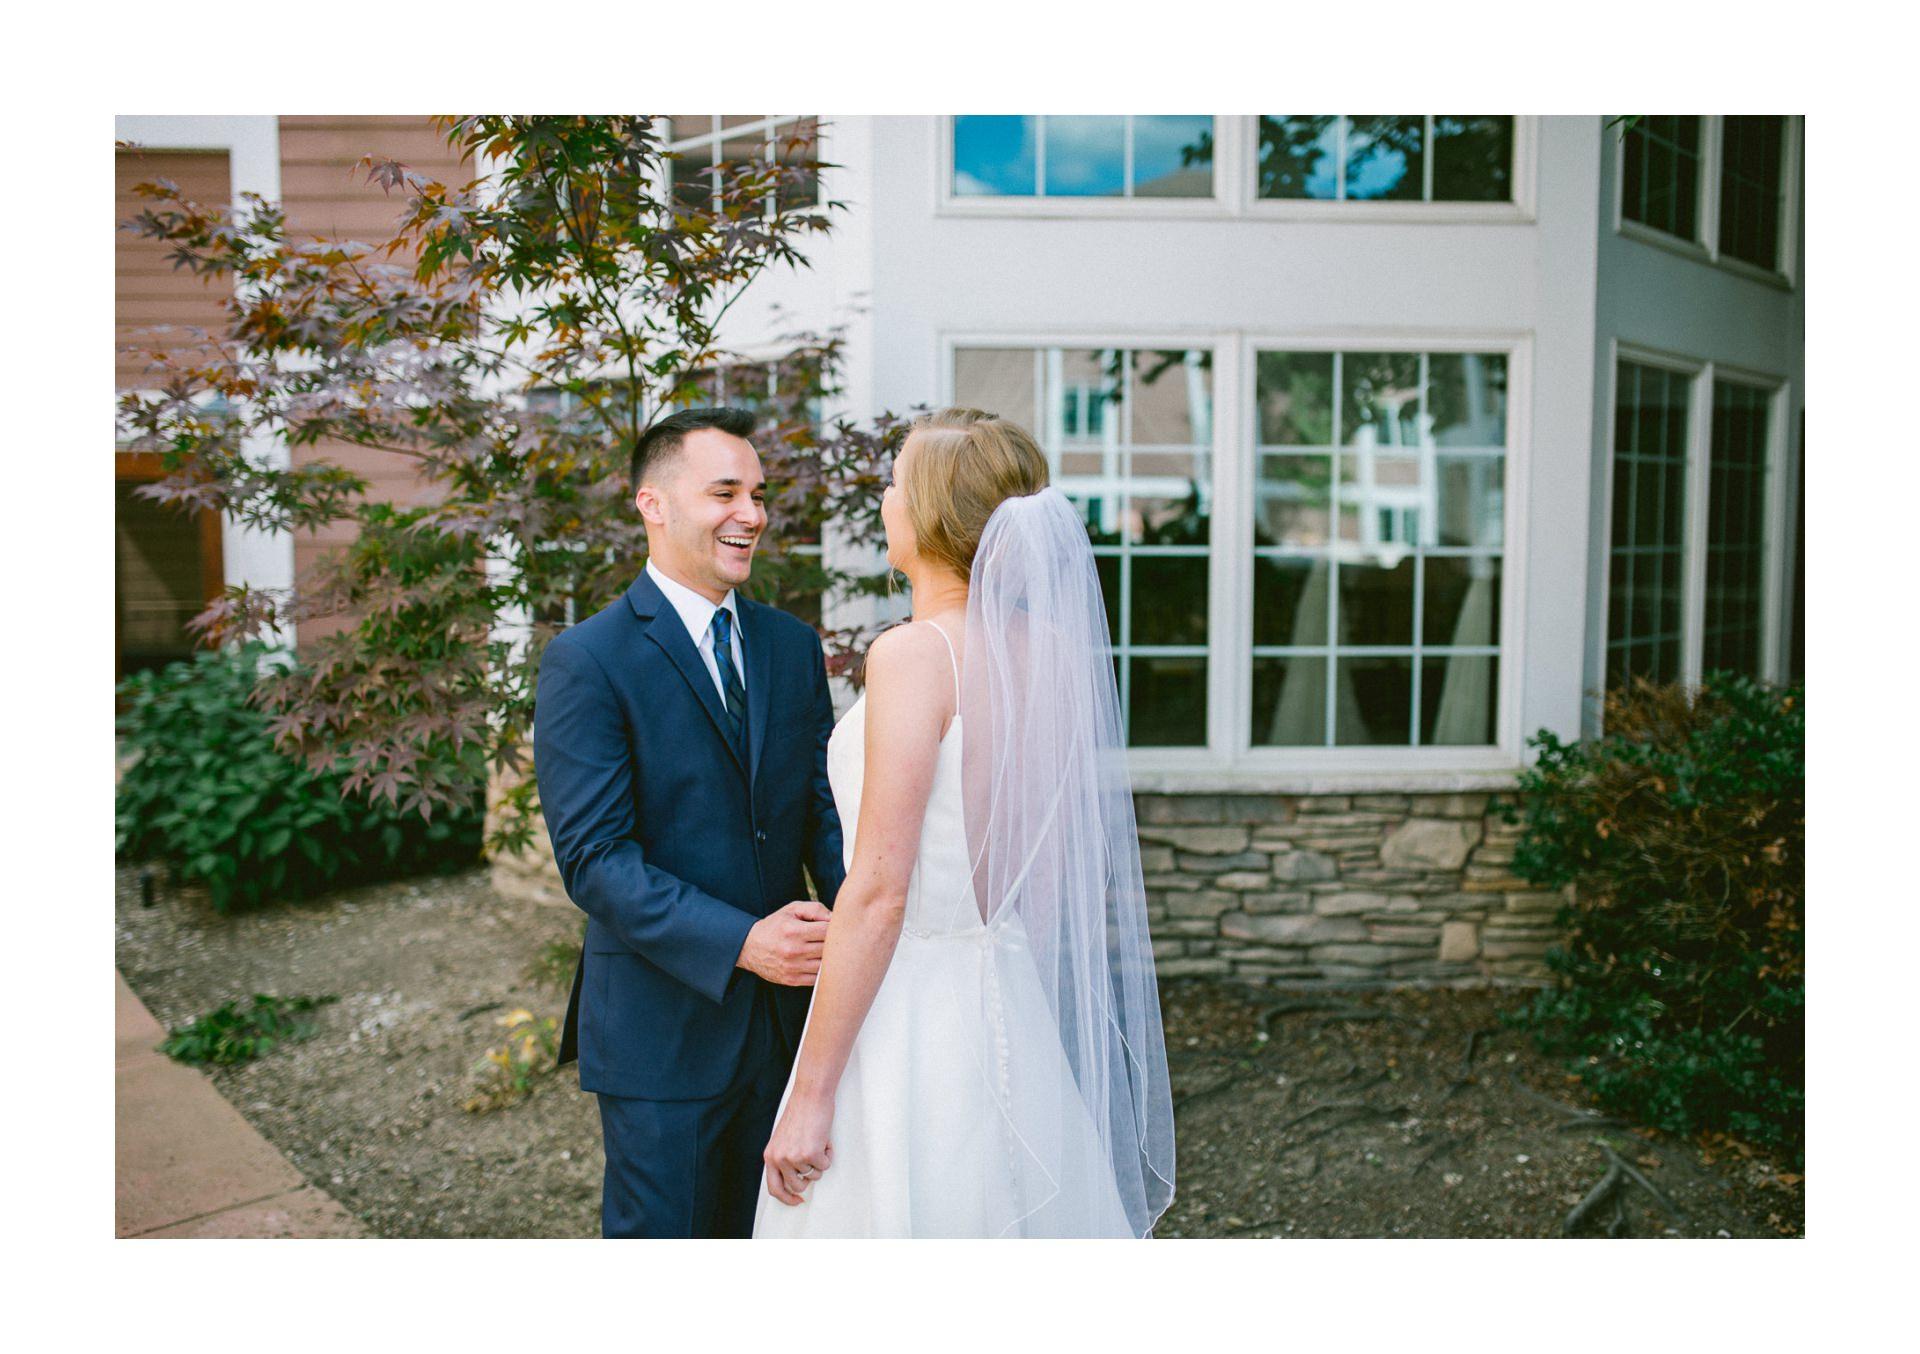 Bertram Inn Wedding Photographer in Aurora 1 20.jpg